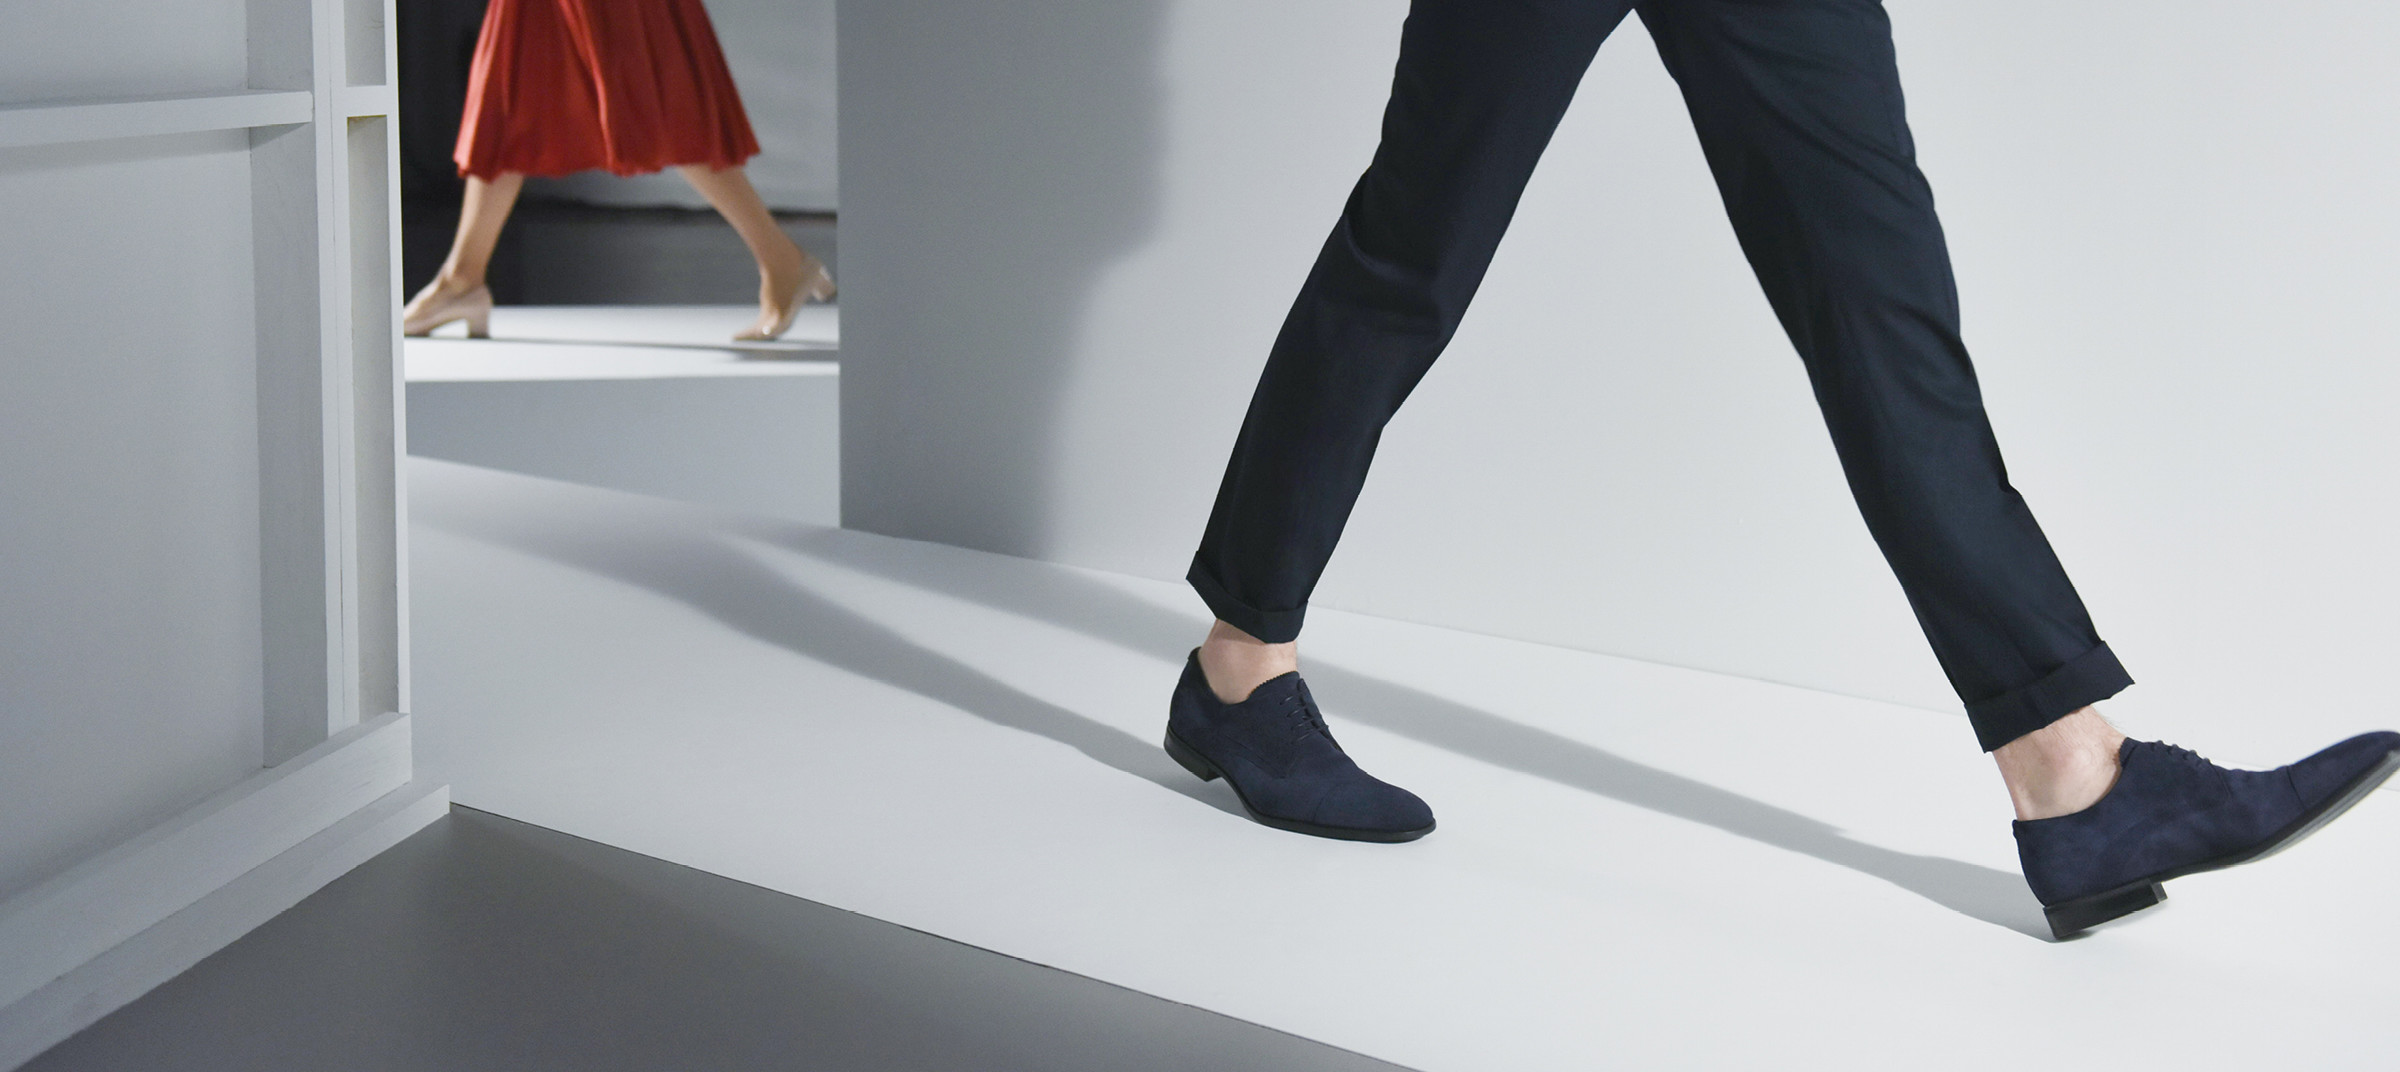 Models walking in Aquatalia's shoes by DTE Studio